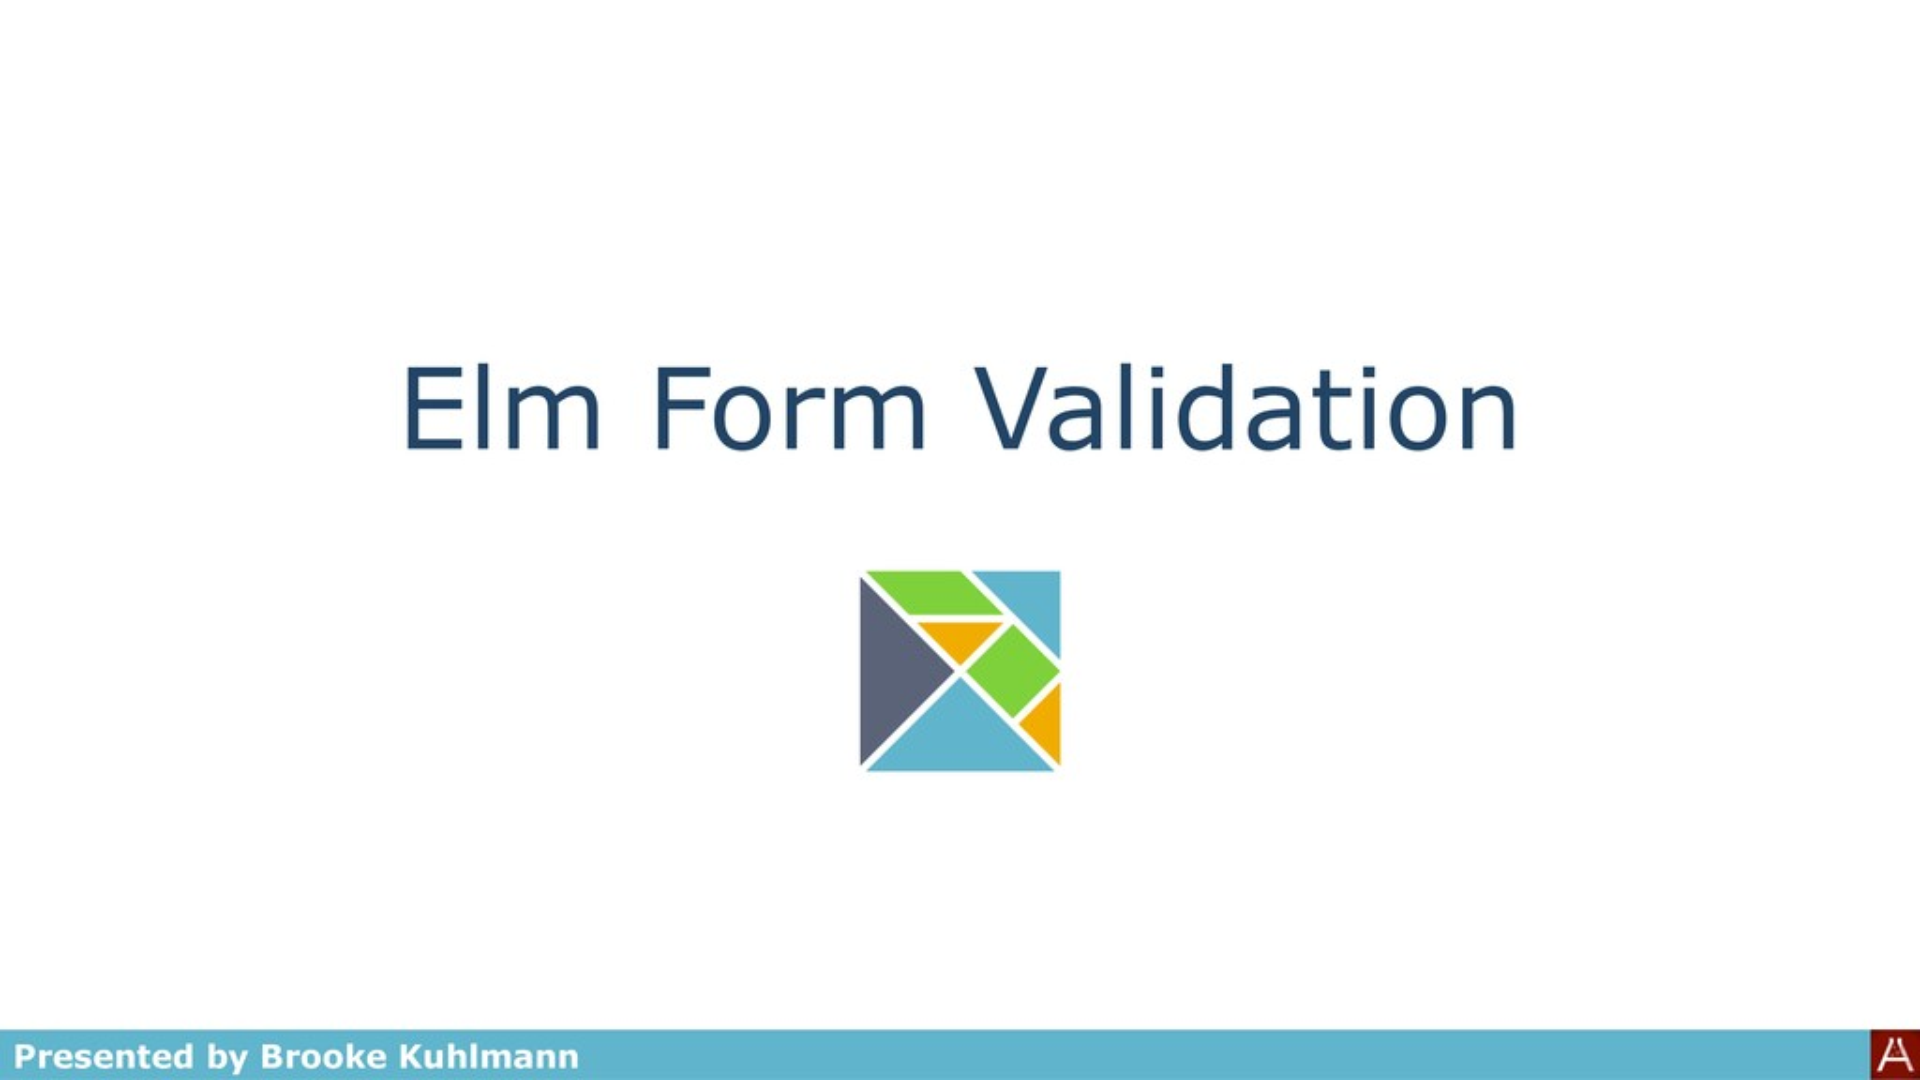 Elm Form Validation Presented by Brooke Kuhlmann